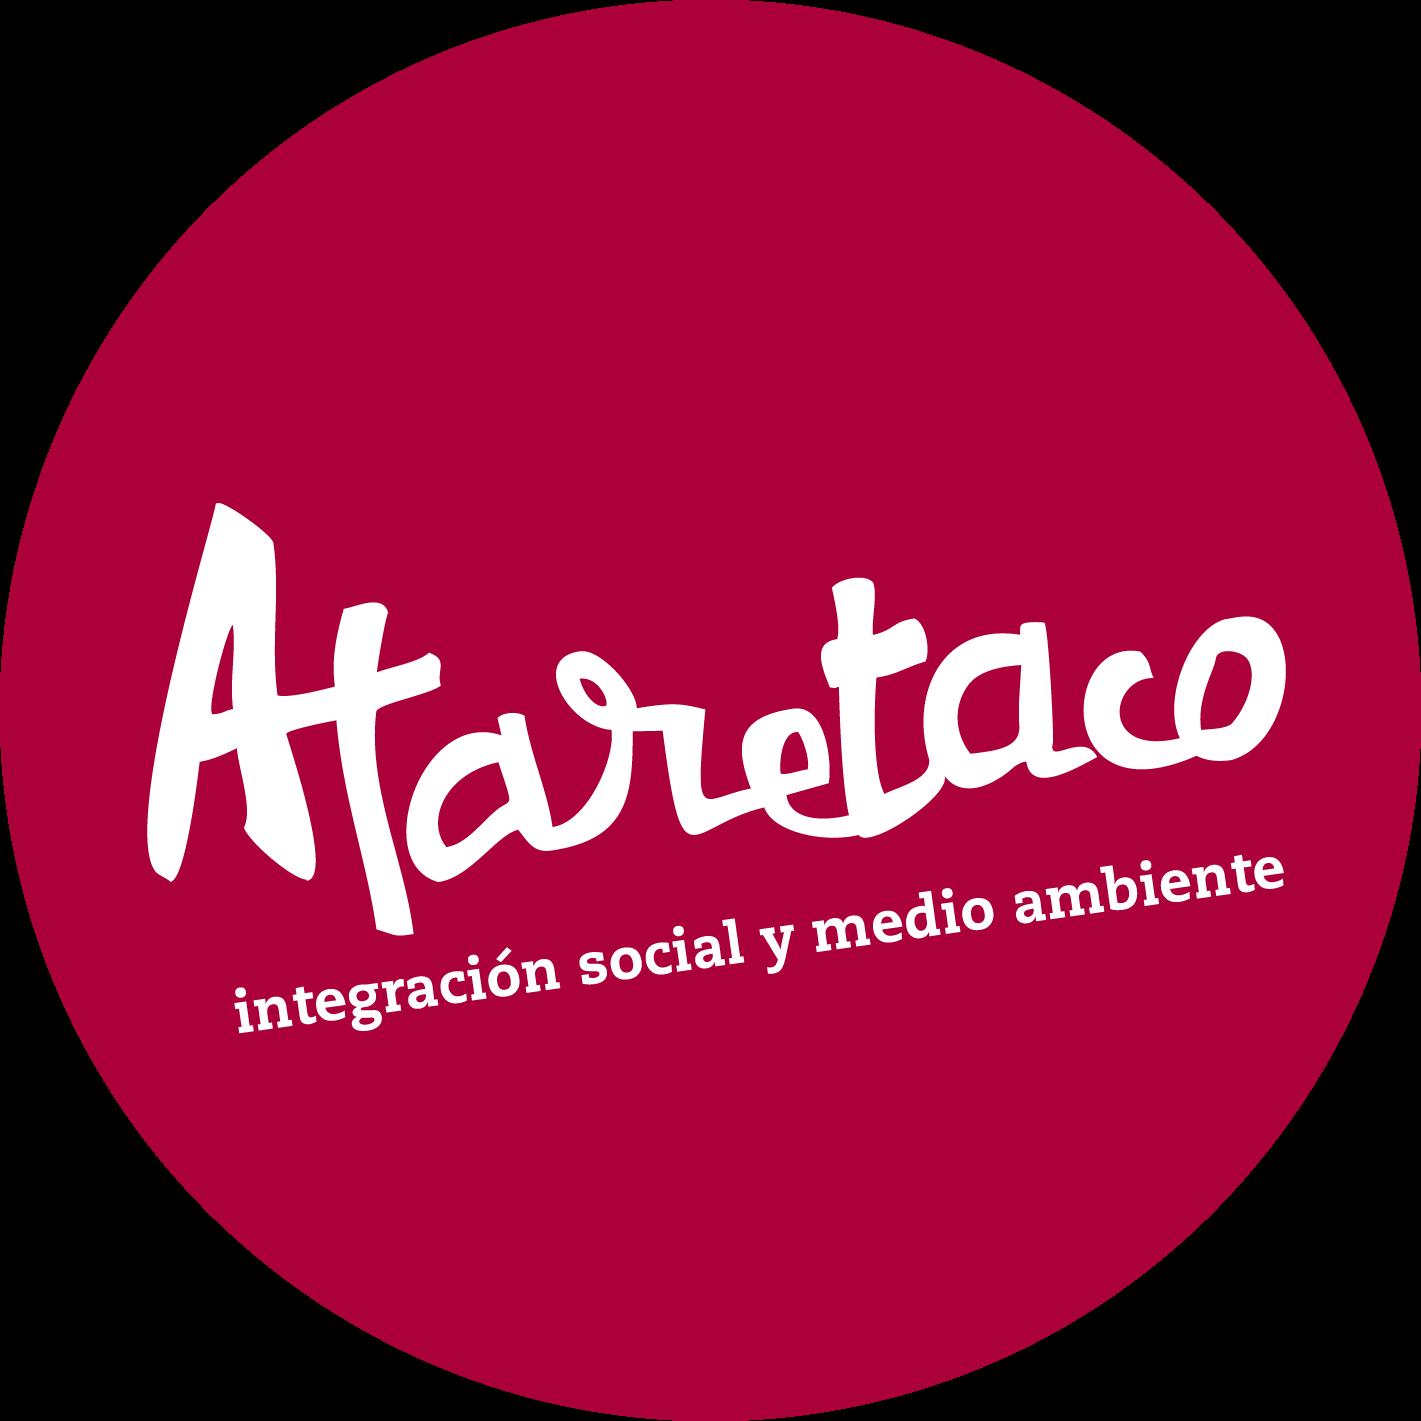 www.ataretaco.org